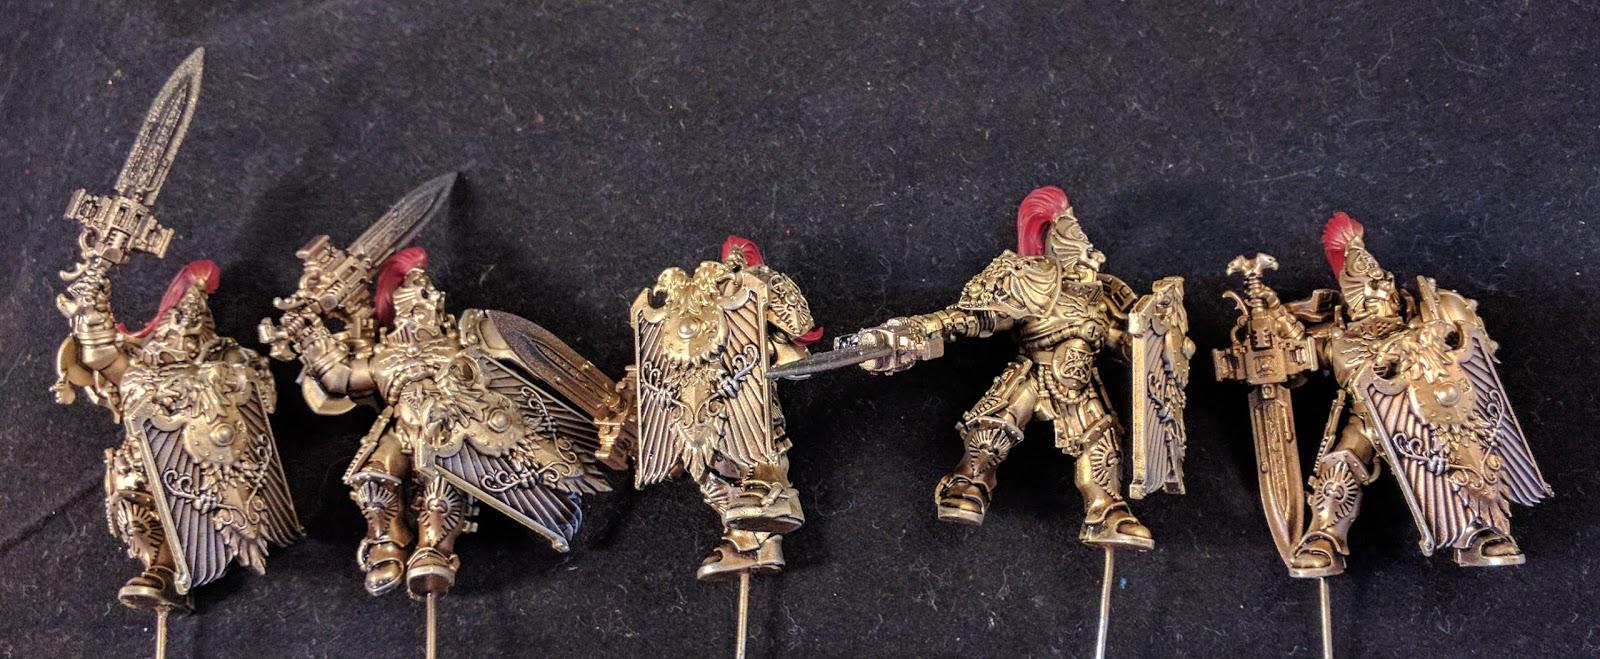 Warhammer 40K//30K Horus Heresy Adeptus Custodes CUSTODIAN GUARD SQUAD New Sealed